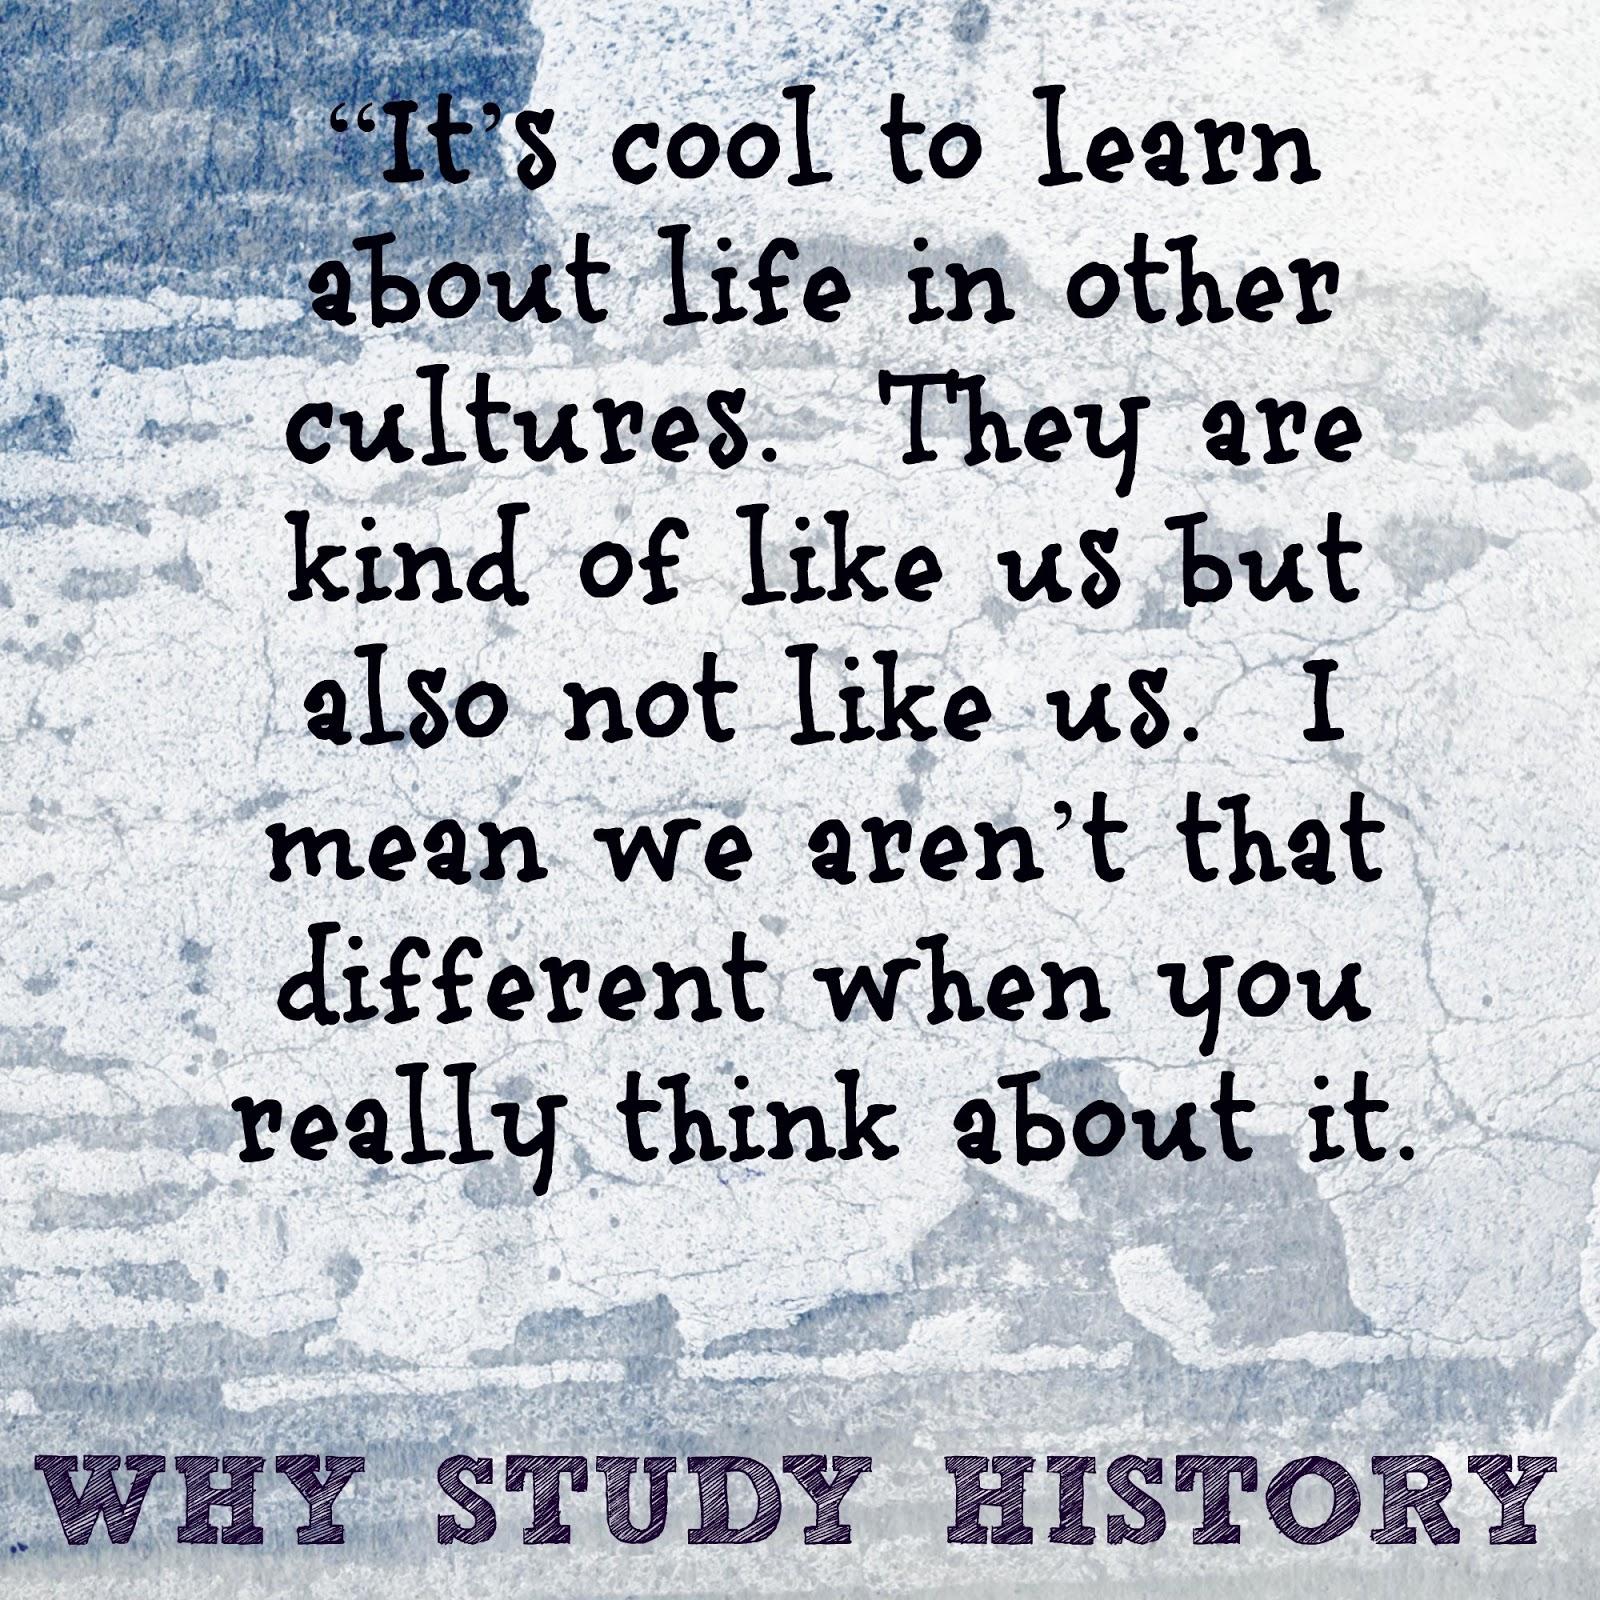 Why study society